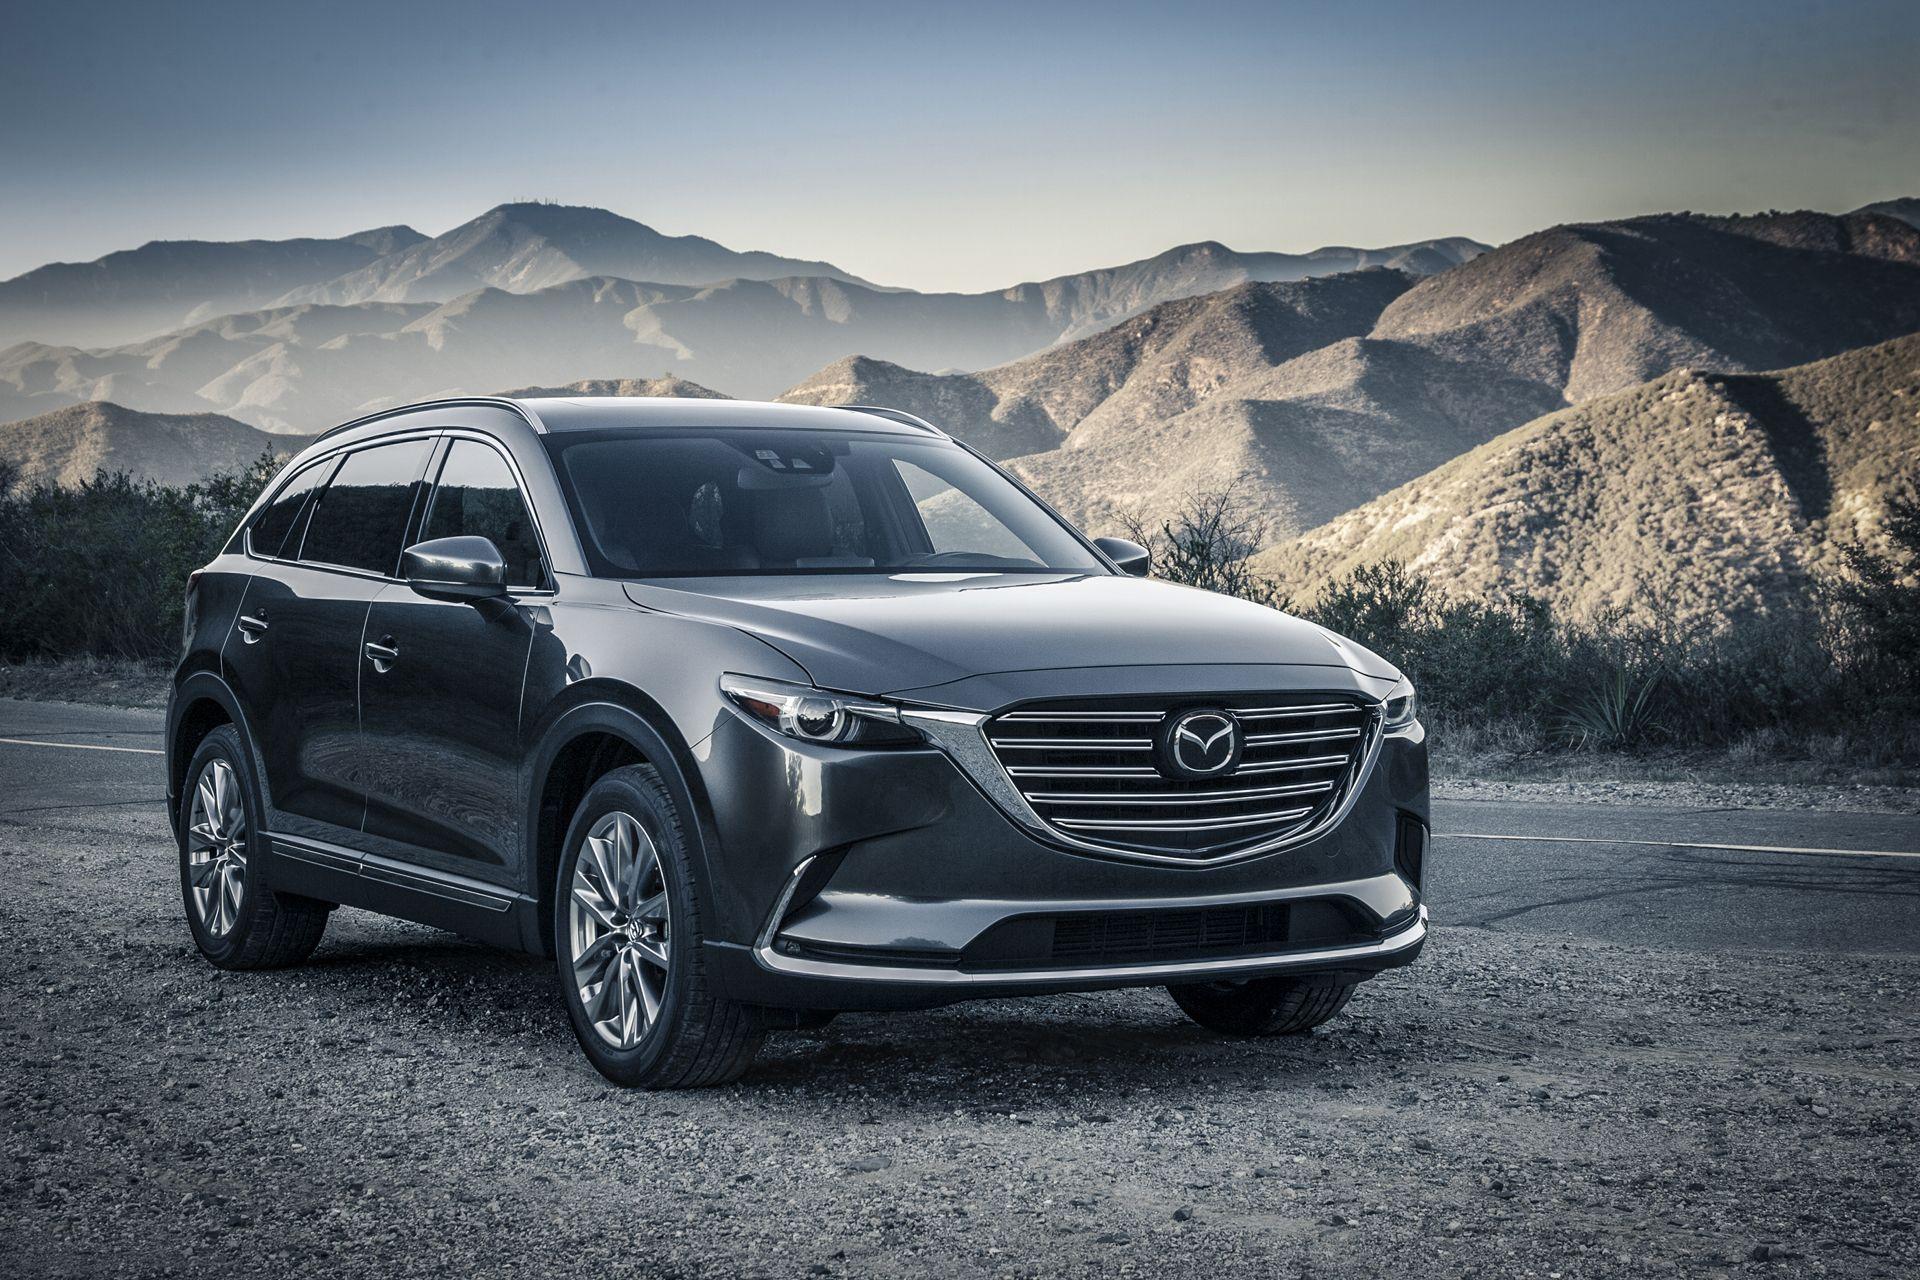 2017 Mazda CX 9 Photo Gallery   Autoblog